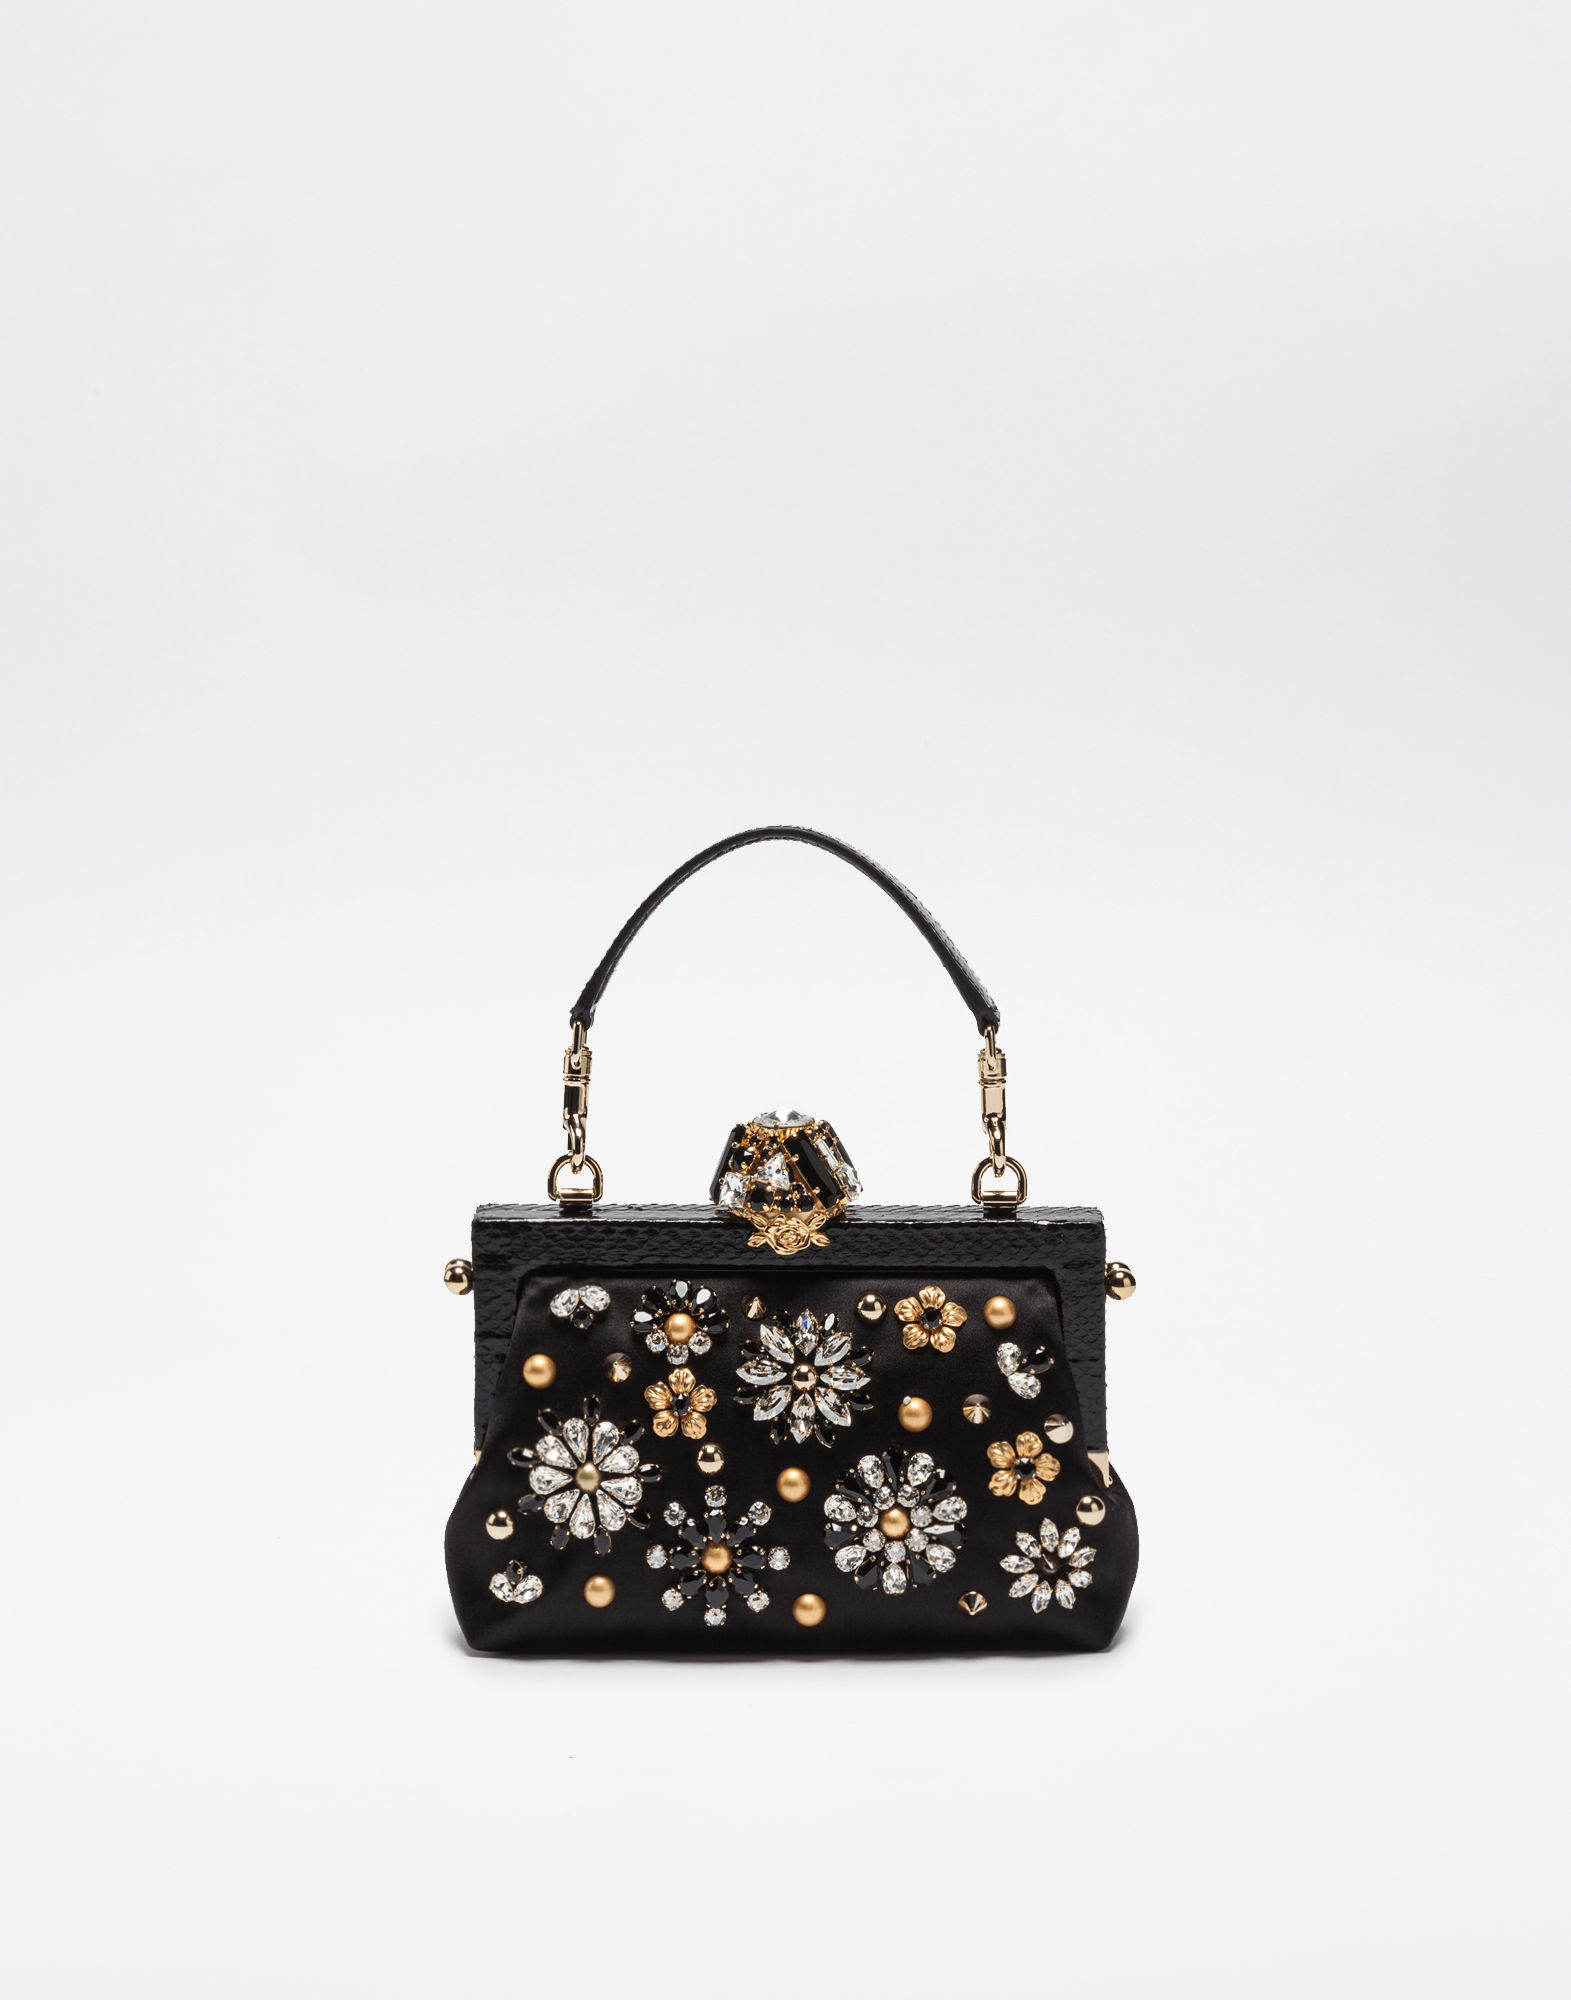 Dolce & Gabbana Chian bags VANDA SATIN CLUTCH WITH JEWEL APPLICATIONS